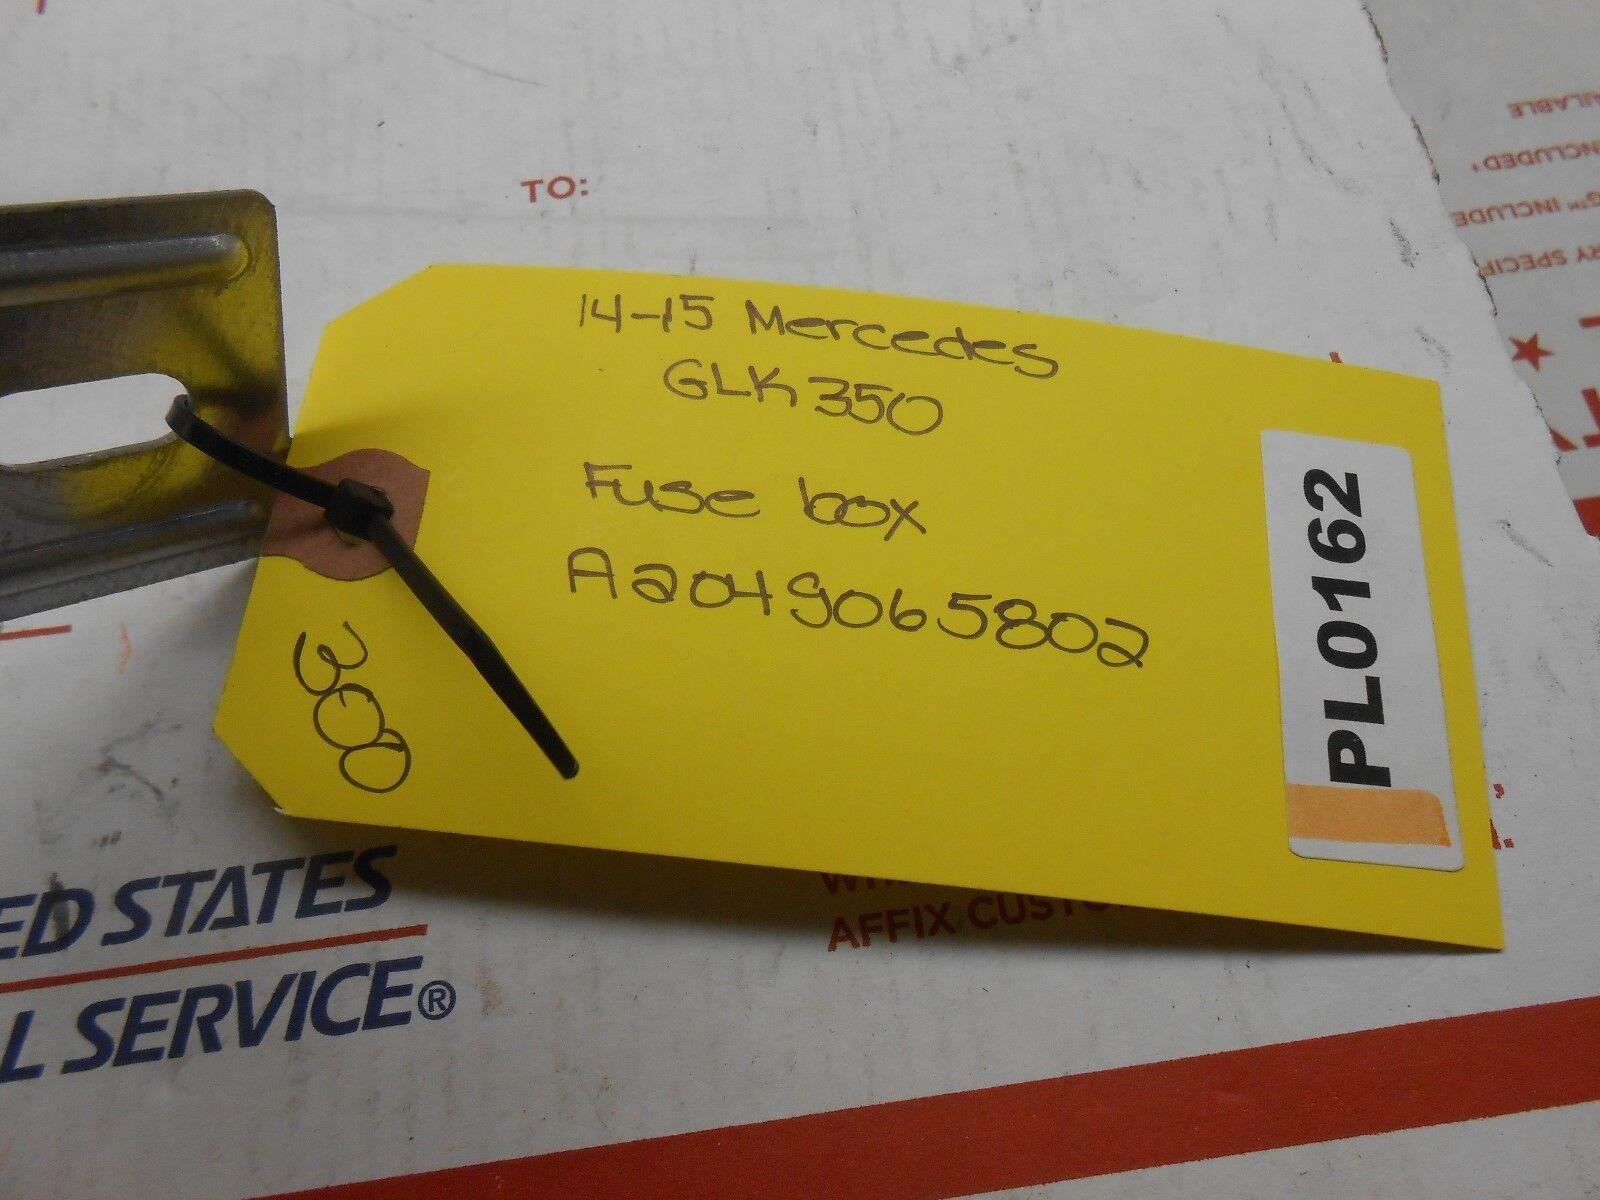 2014-2015 mercedes glk350 fuse box a 2049065802 pl0162